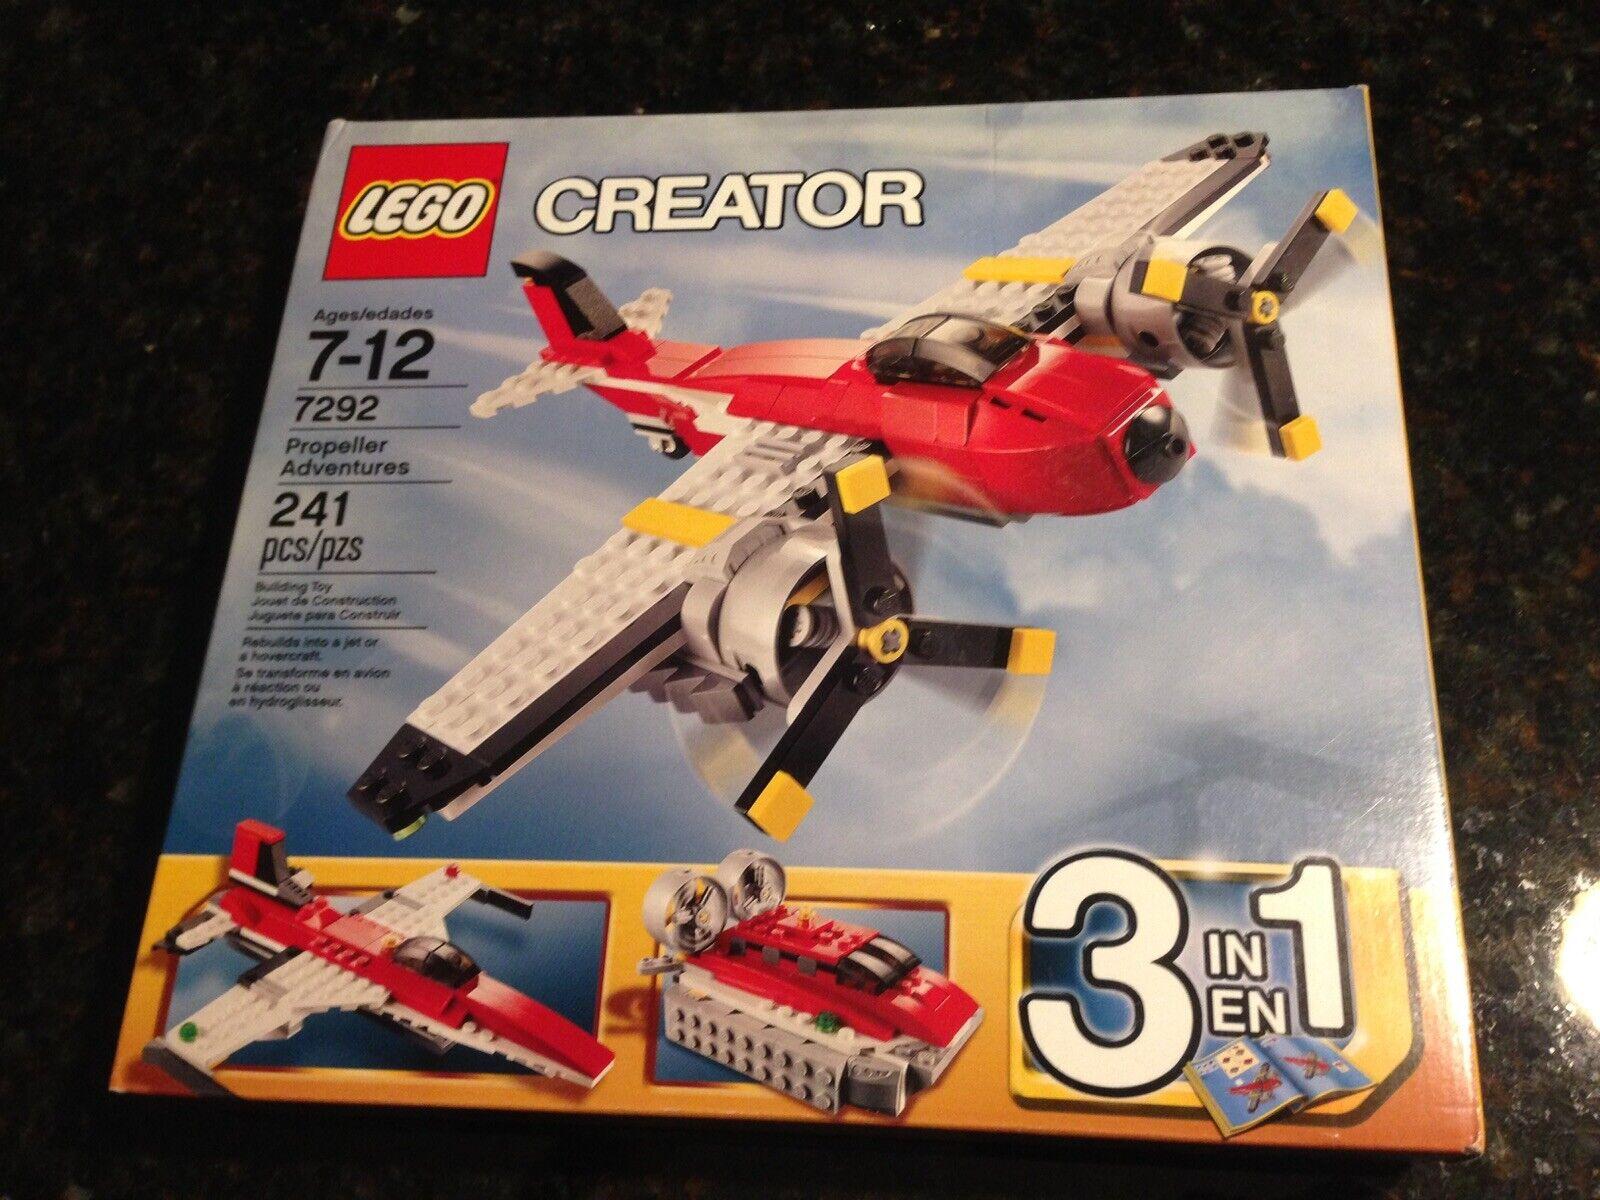 LEGO Creator Propeller Adventures 7292 7292 7292 82334b